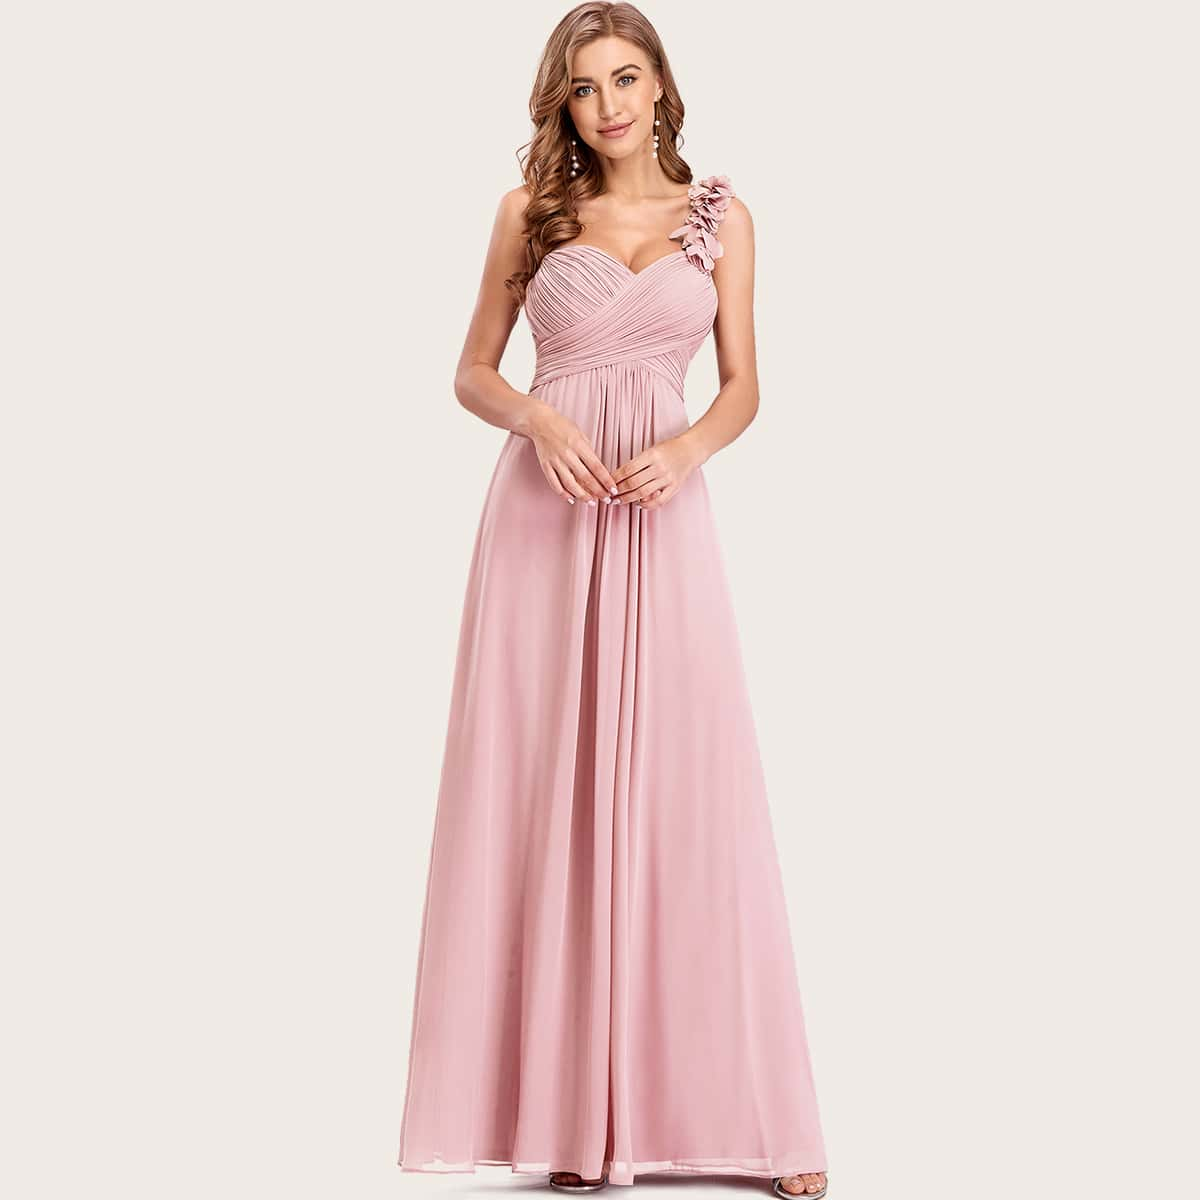 Платье на одно плечо SheIn swdress42200702276